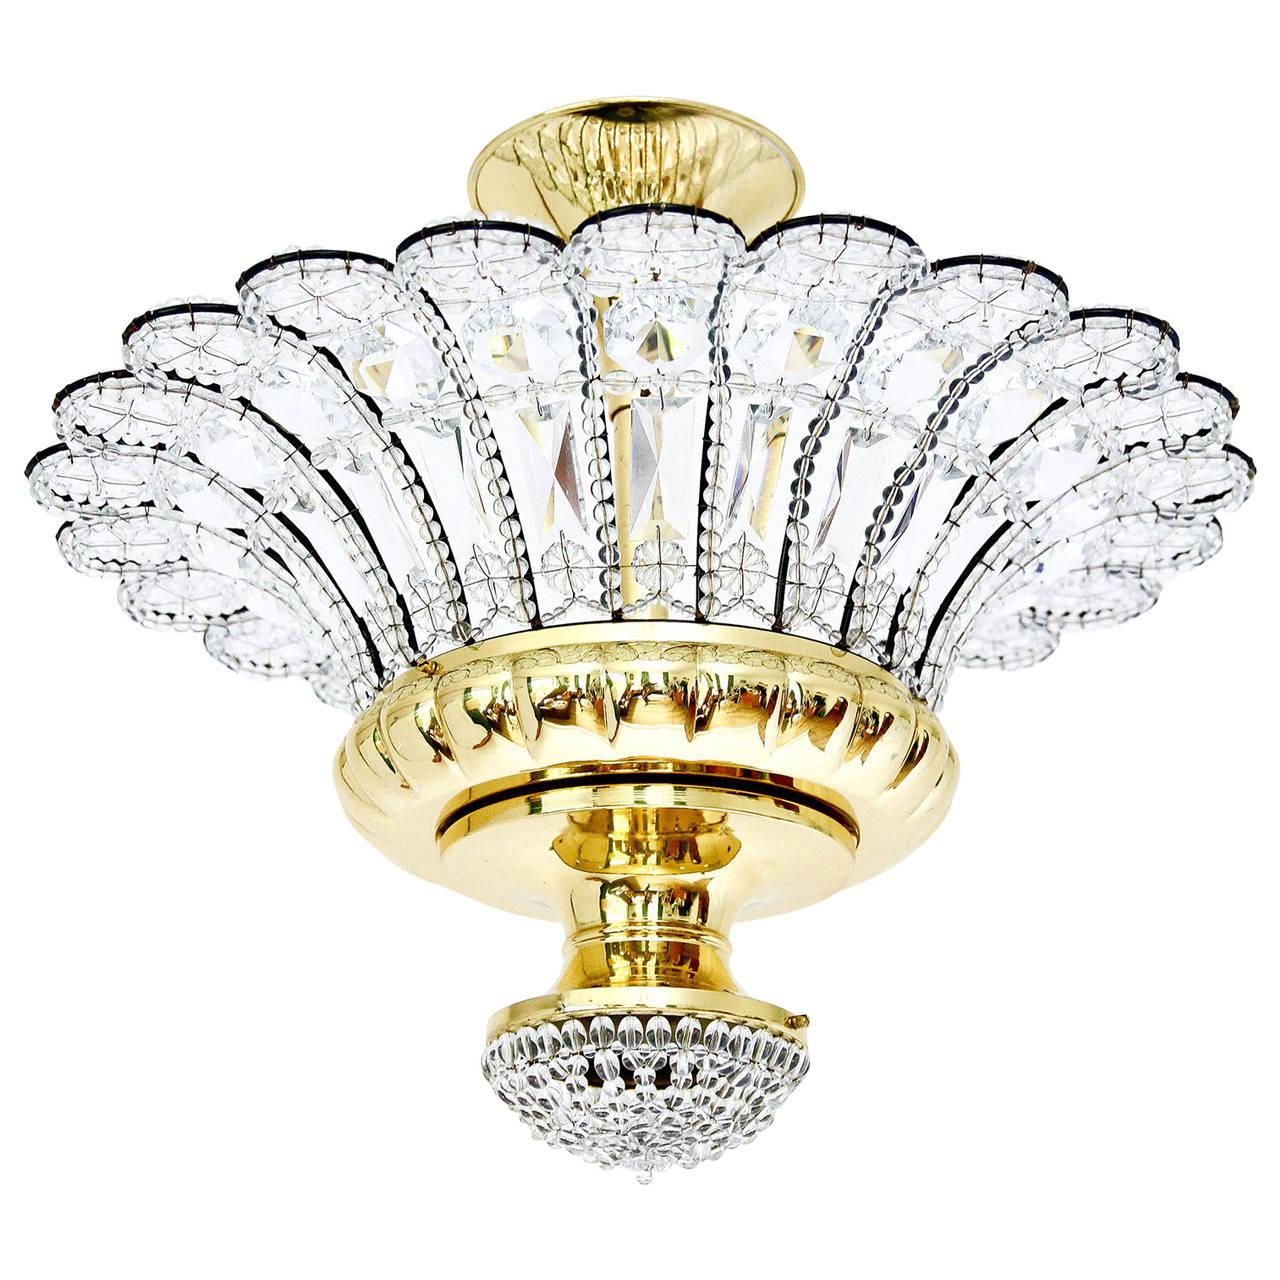 Large Italian Flush Mount Light, Brass and Crystal Glass